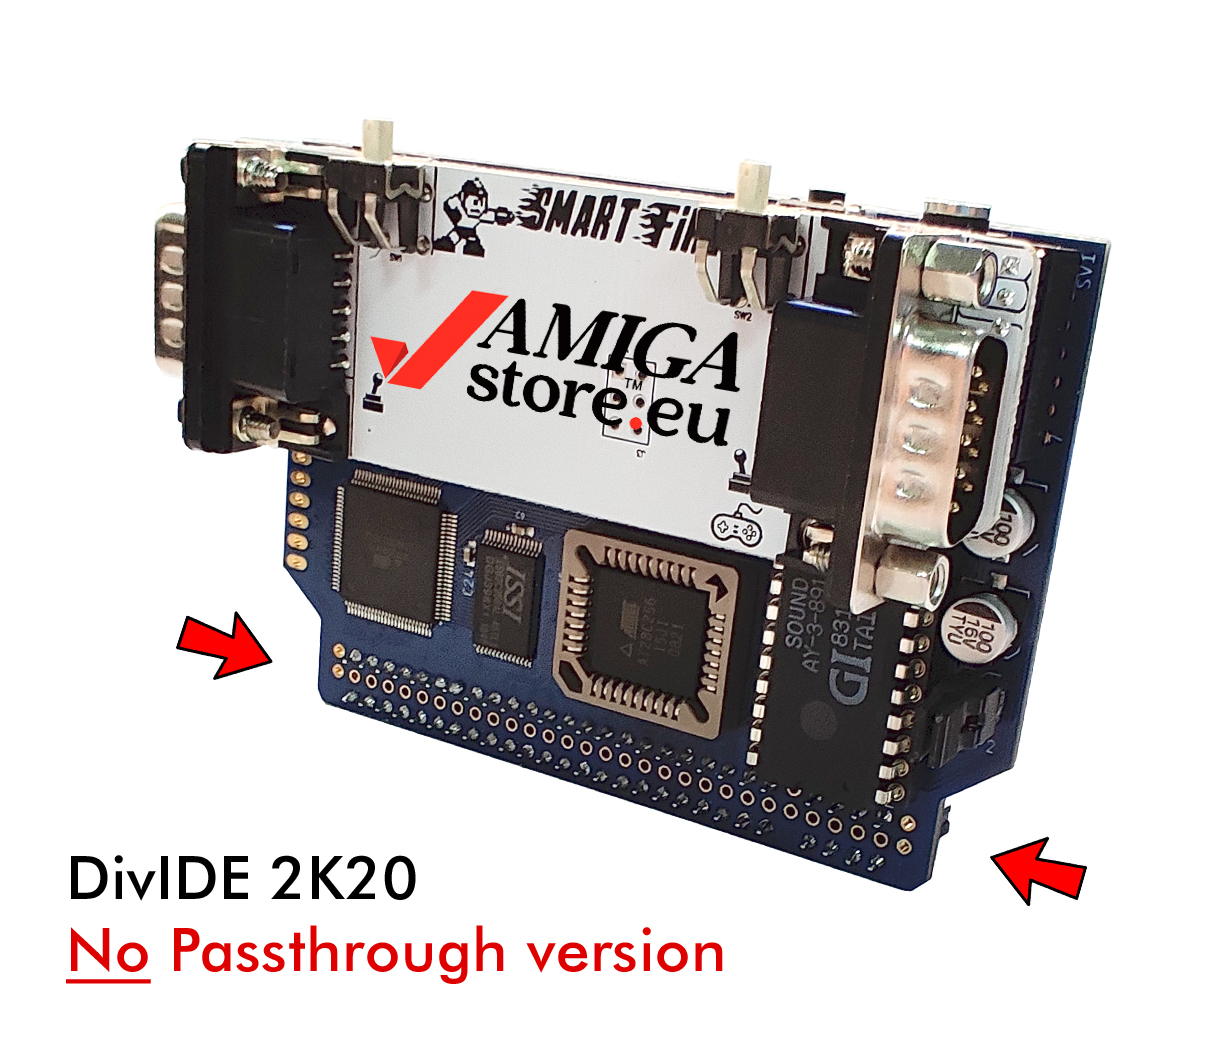 DivIDE 2k20 no passthrough version